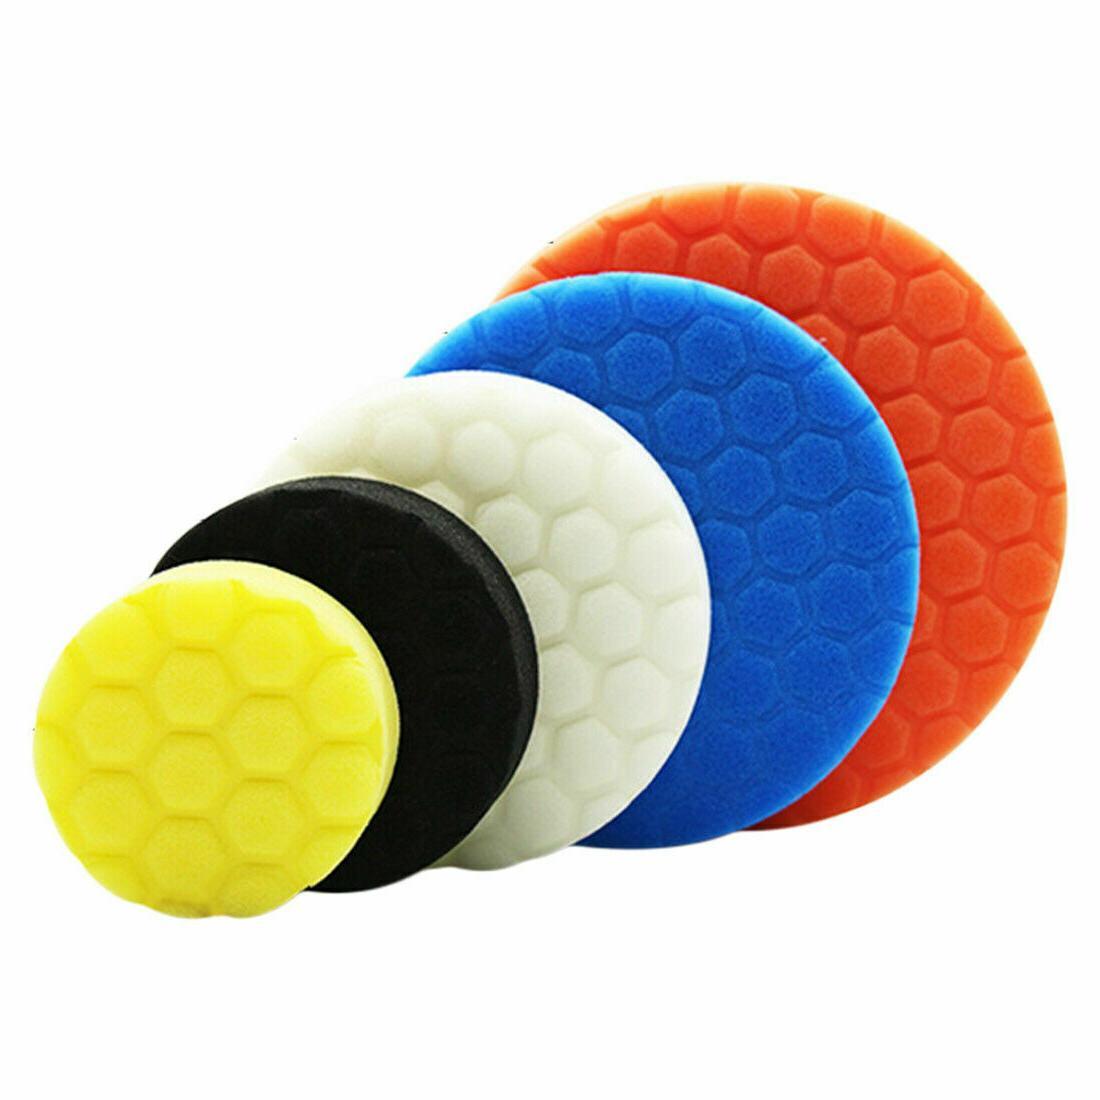 5PCs 3/4/5/6/7 Polishing Sponge Buffing Pads Disc Wax Set